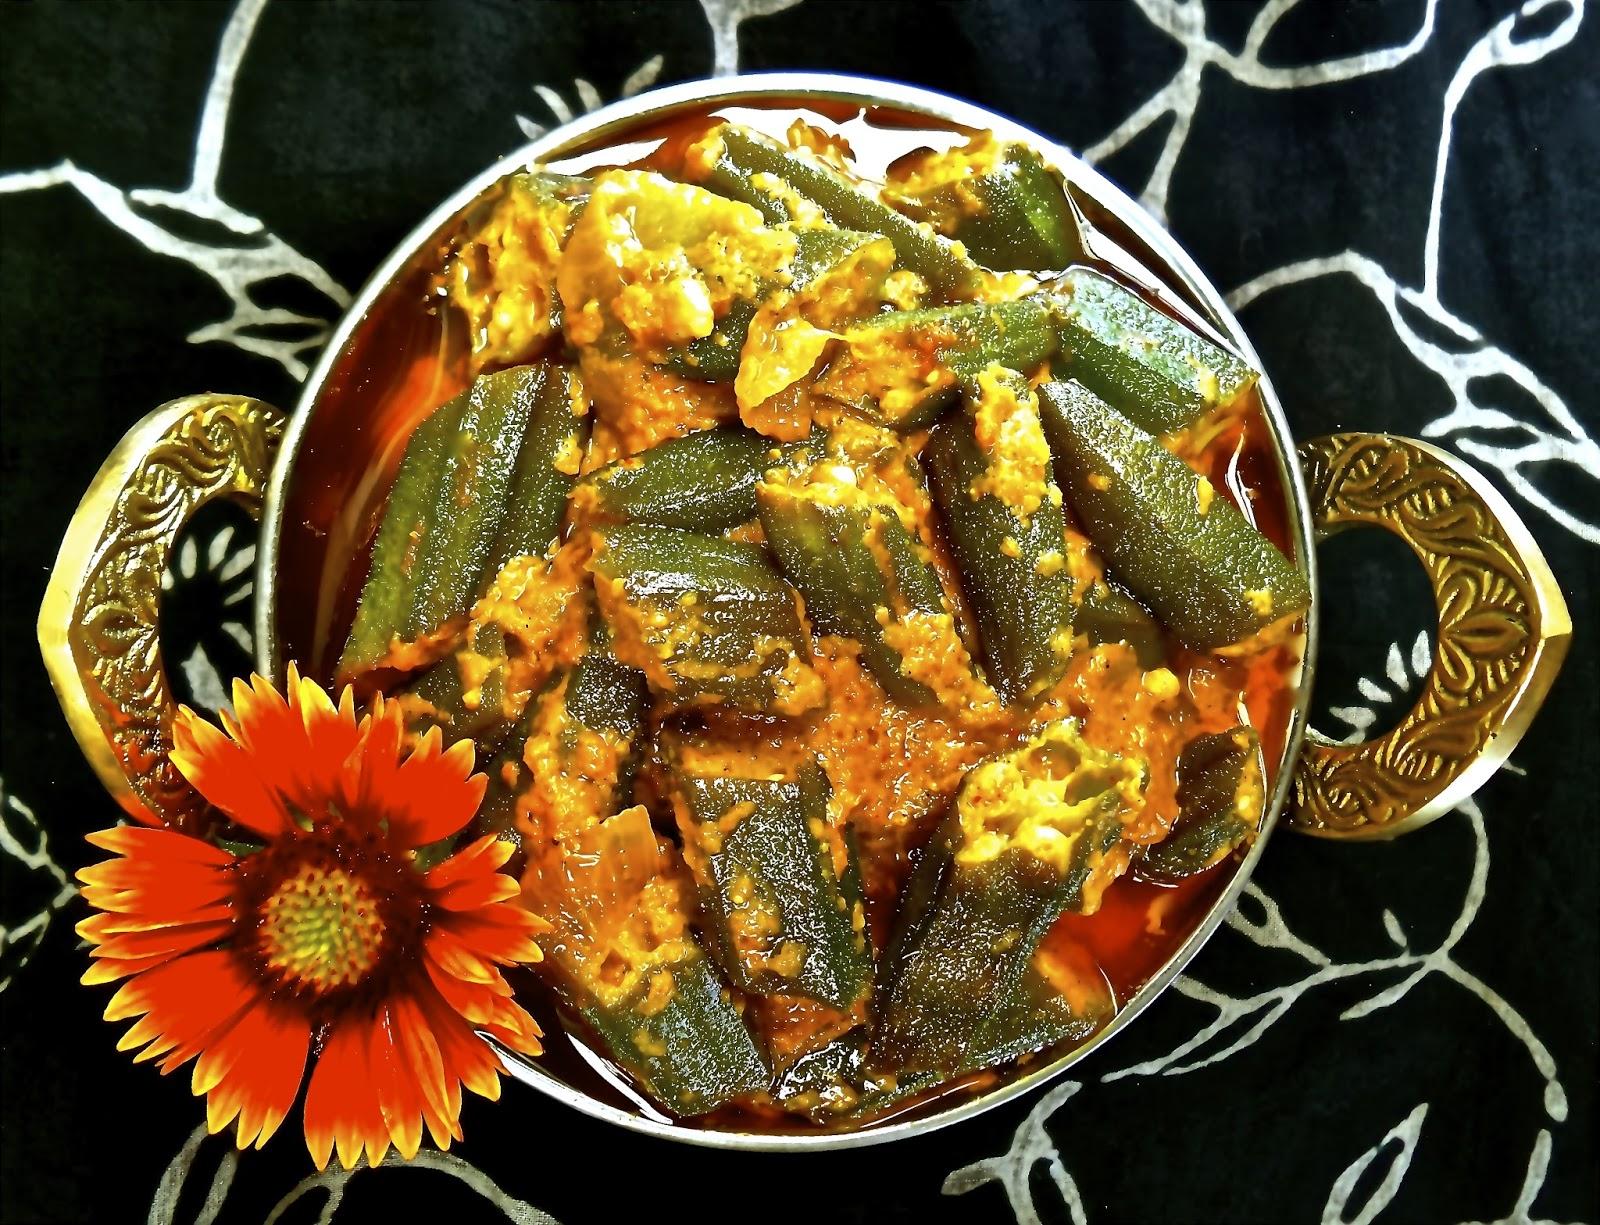 Keep Calm & Curry Dahi Bhindi Curried Okra with Yogurt